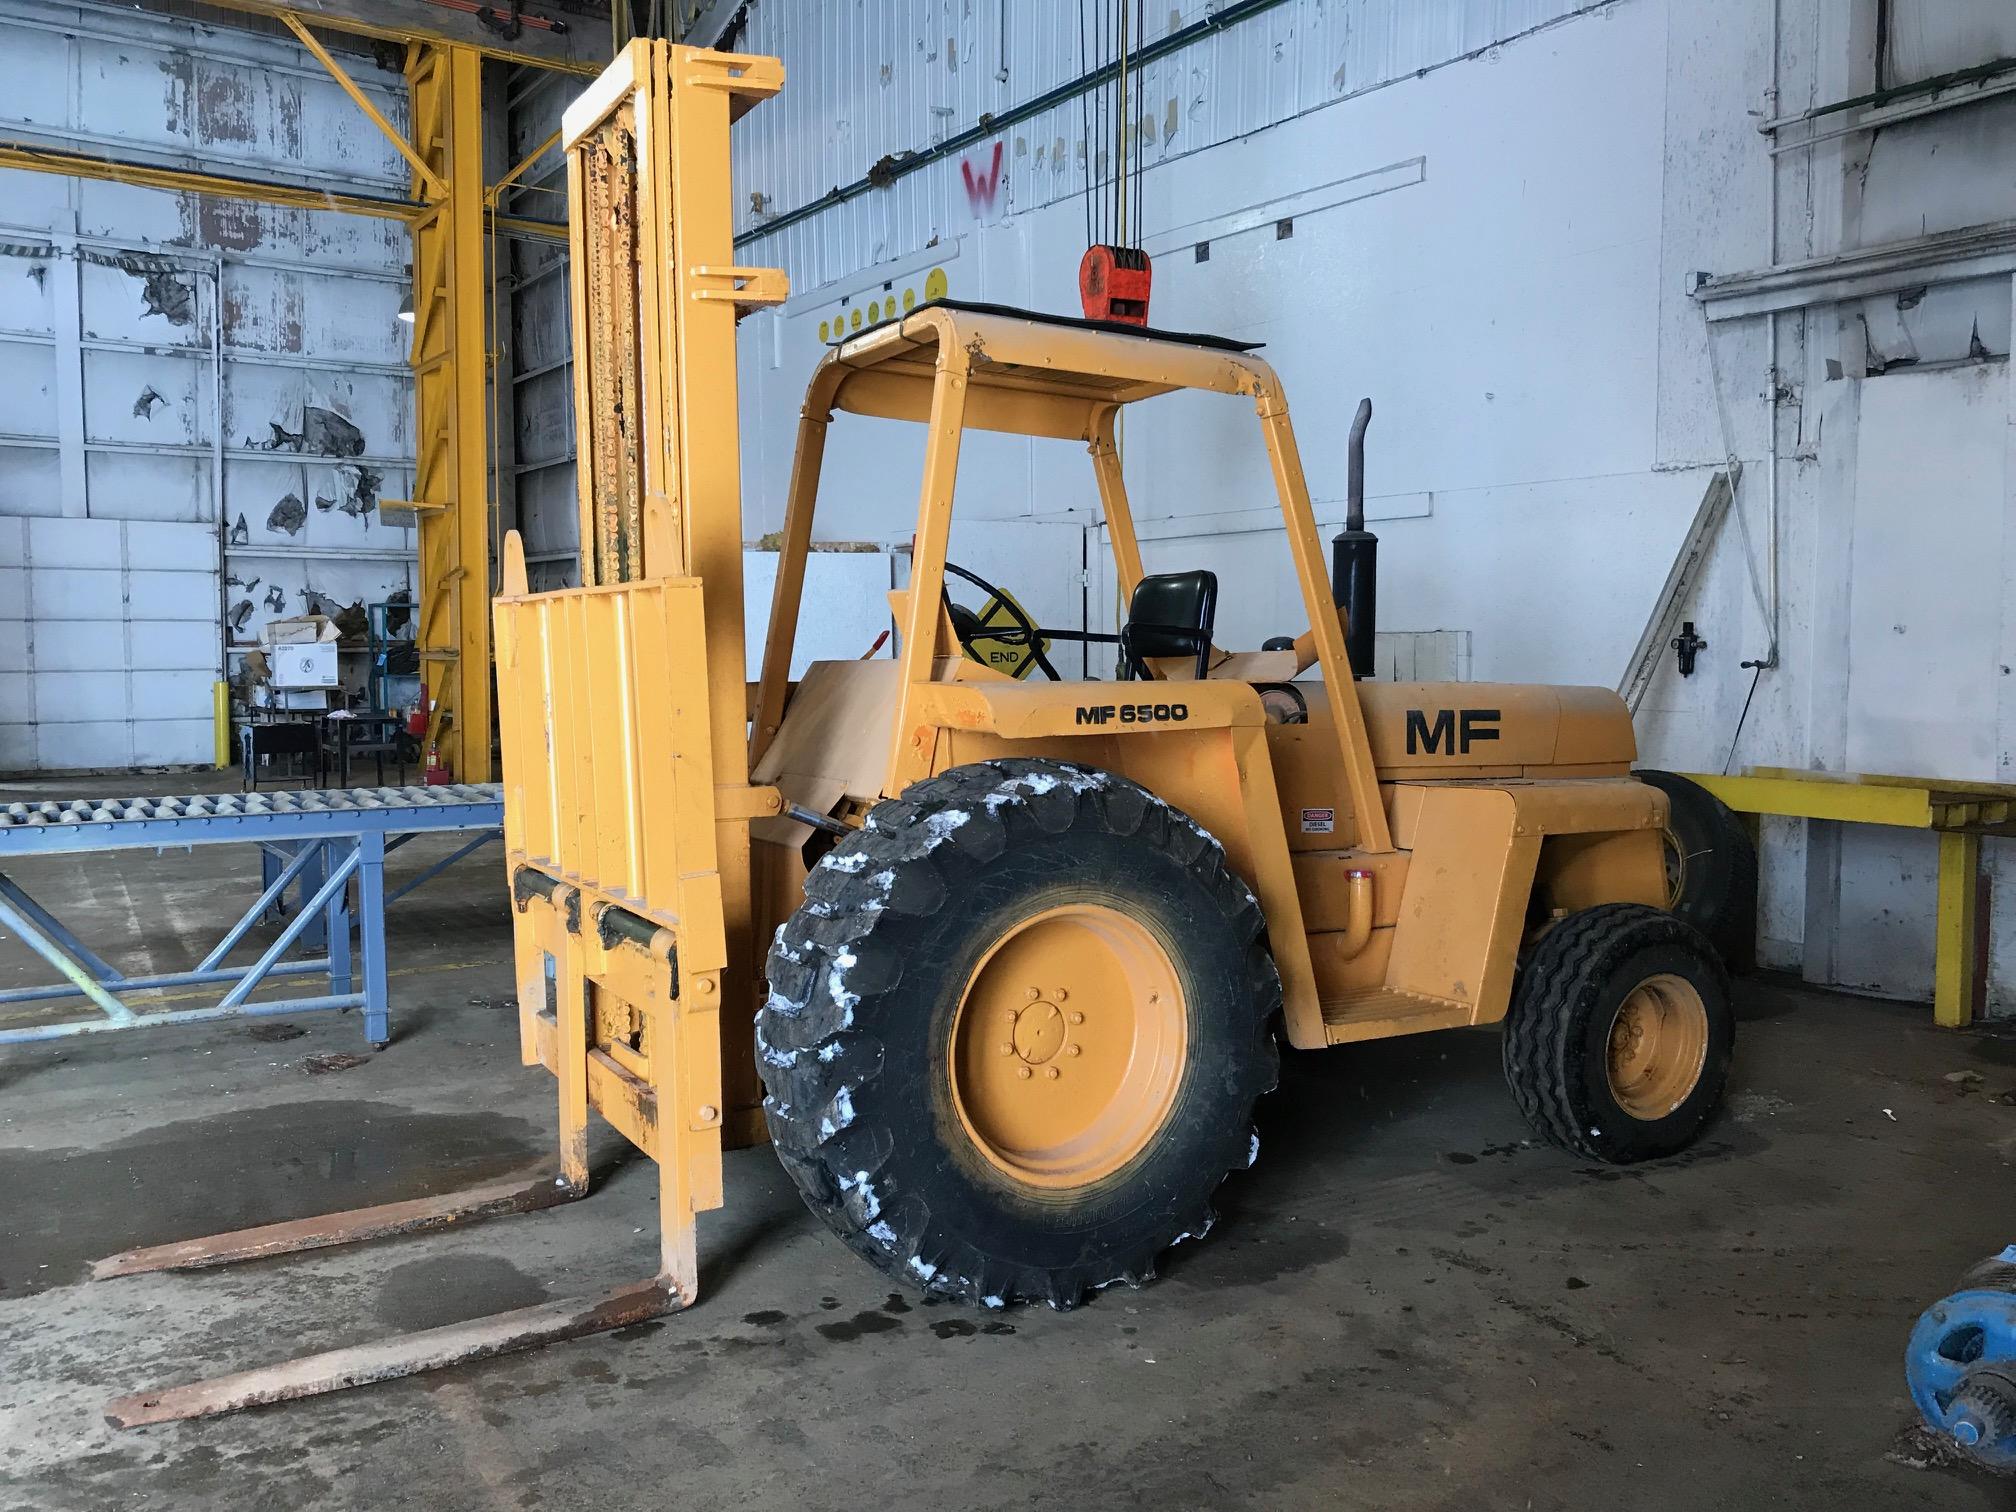 MASSEY FERGUSON MODEL MF6500 6,500-Lbs. Capacity Diesel Powered Rough Terrain Fork Lift Truck